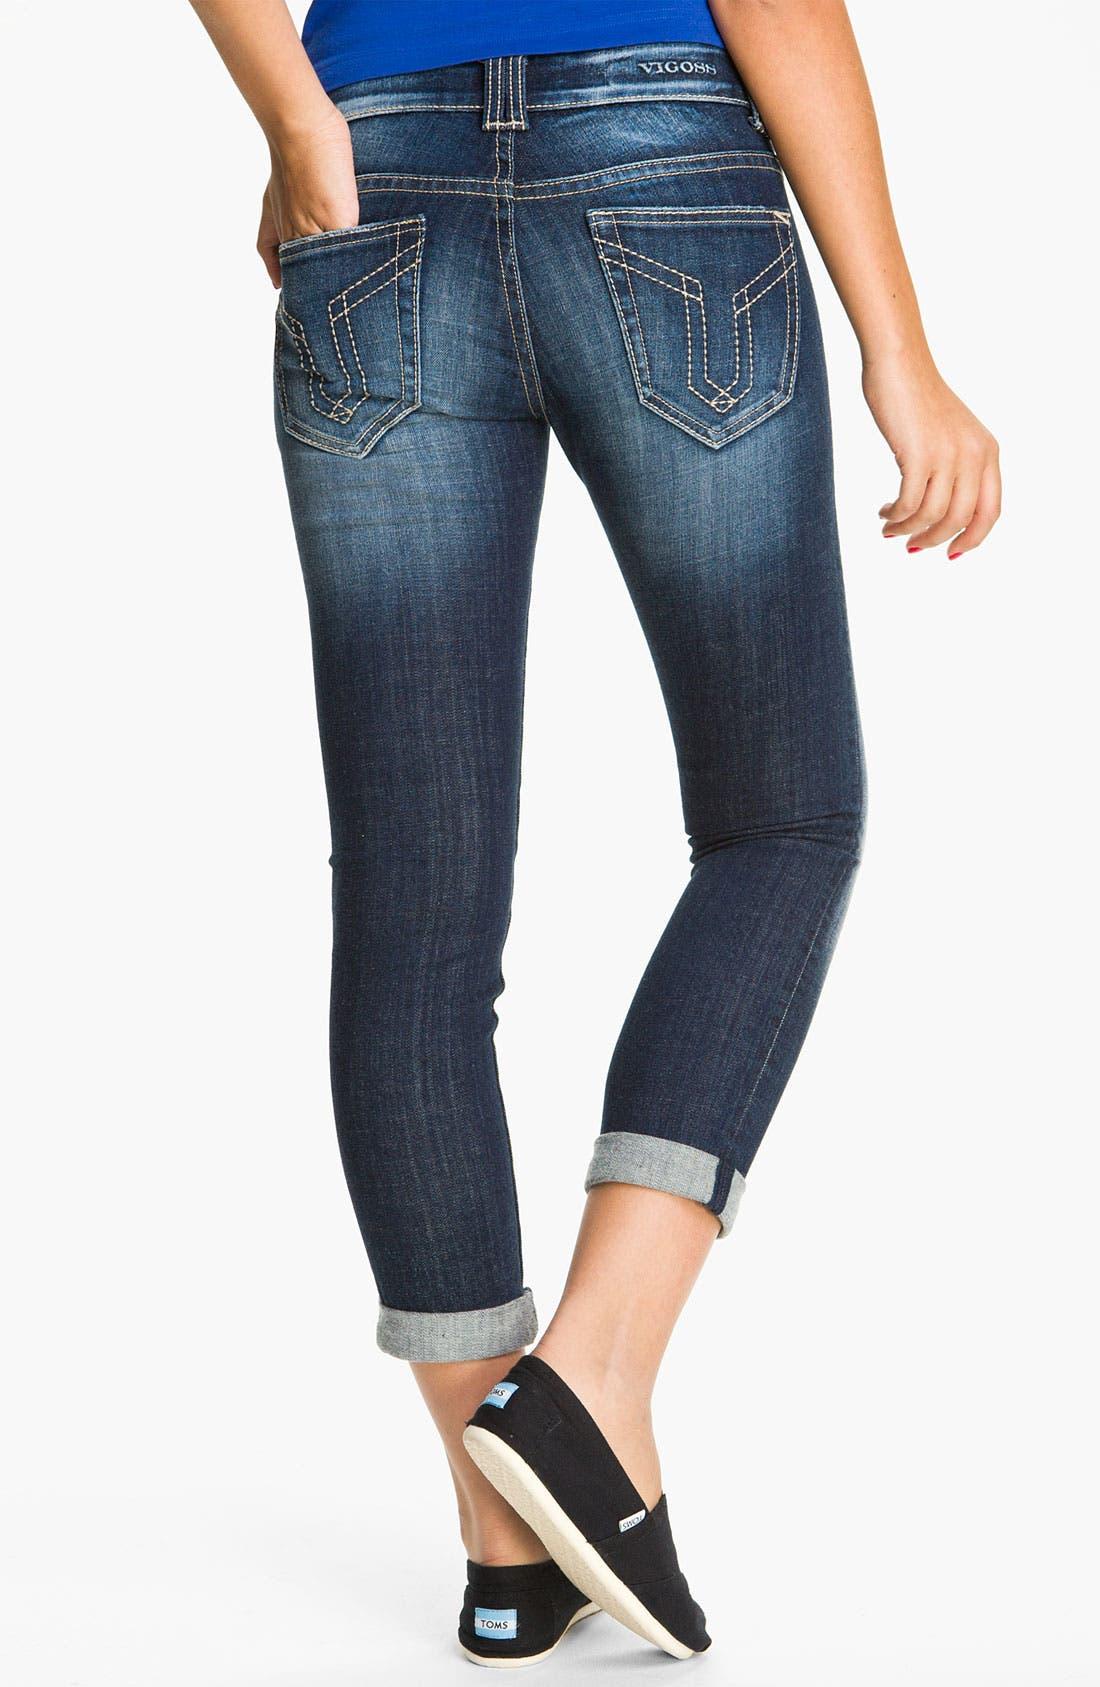 Main Image - Vigoss 'Thompson' Stretch Jeans (Dark) (Juniors)